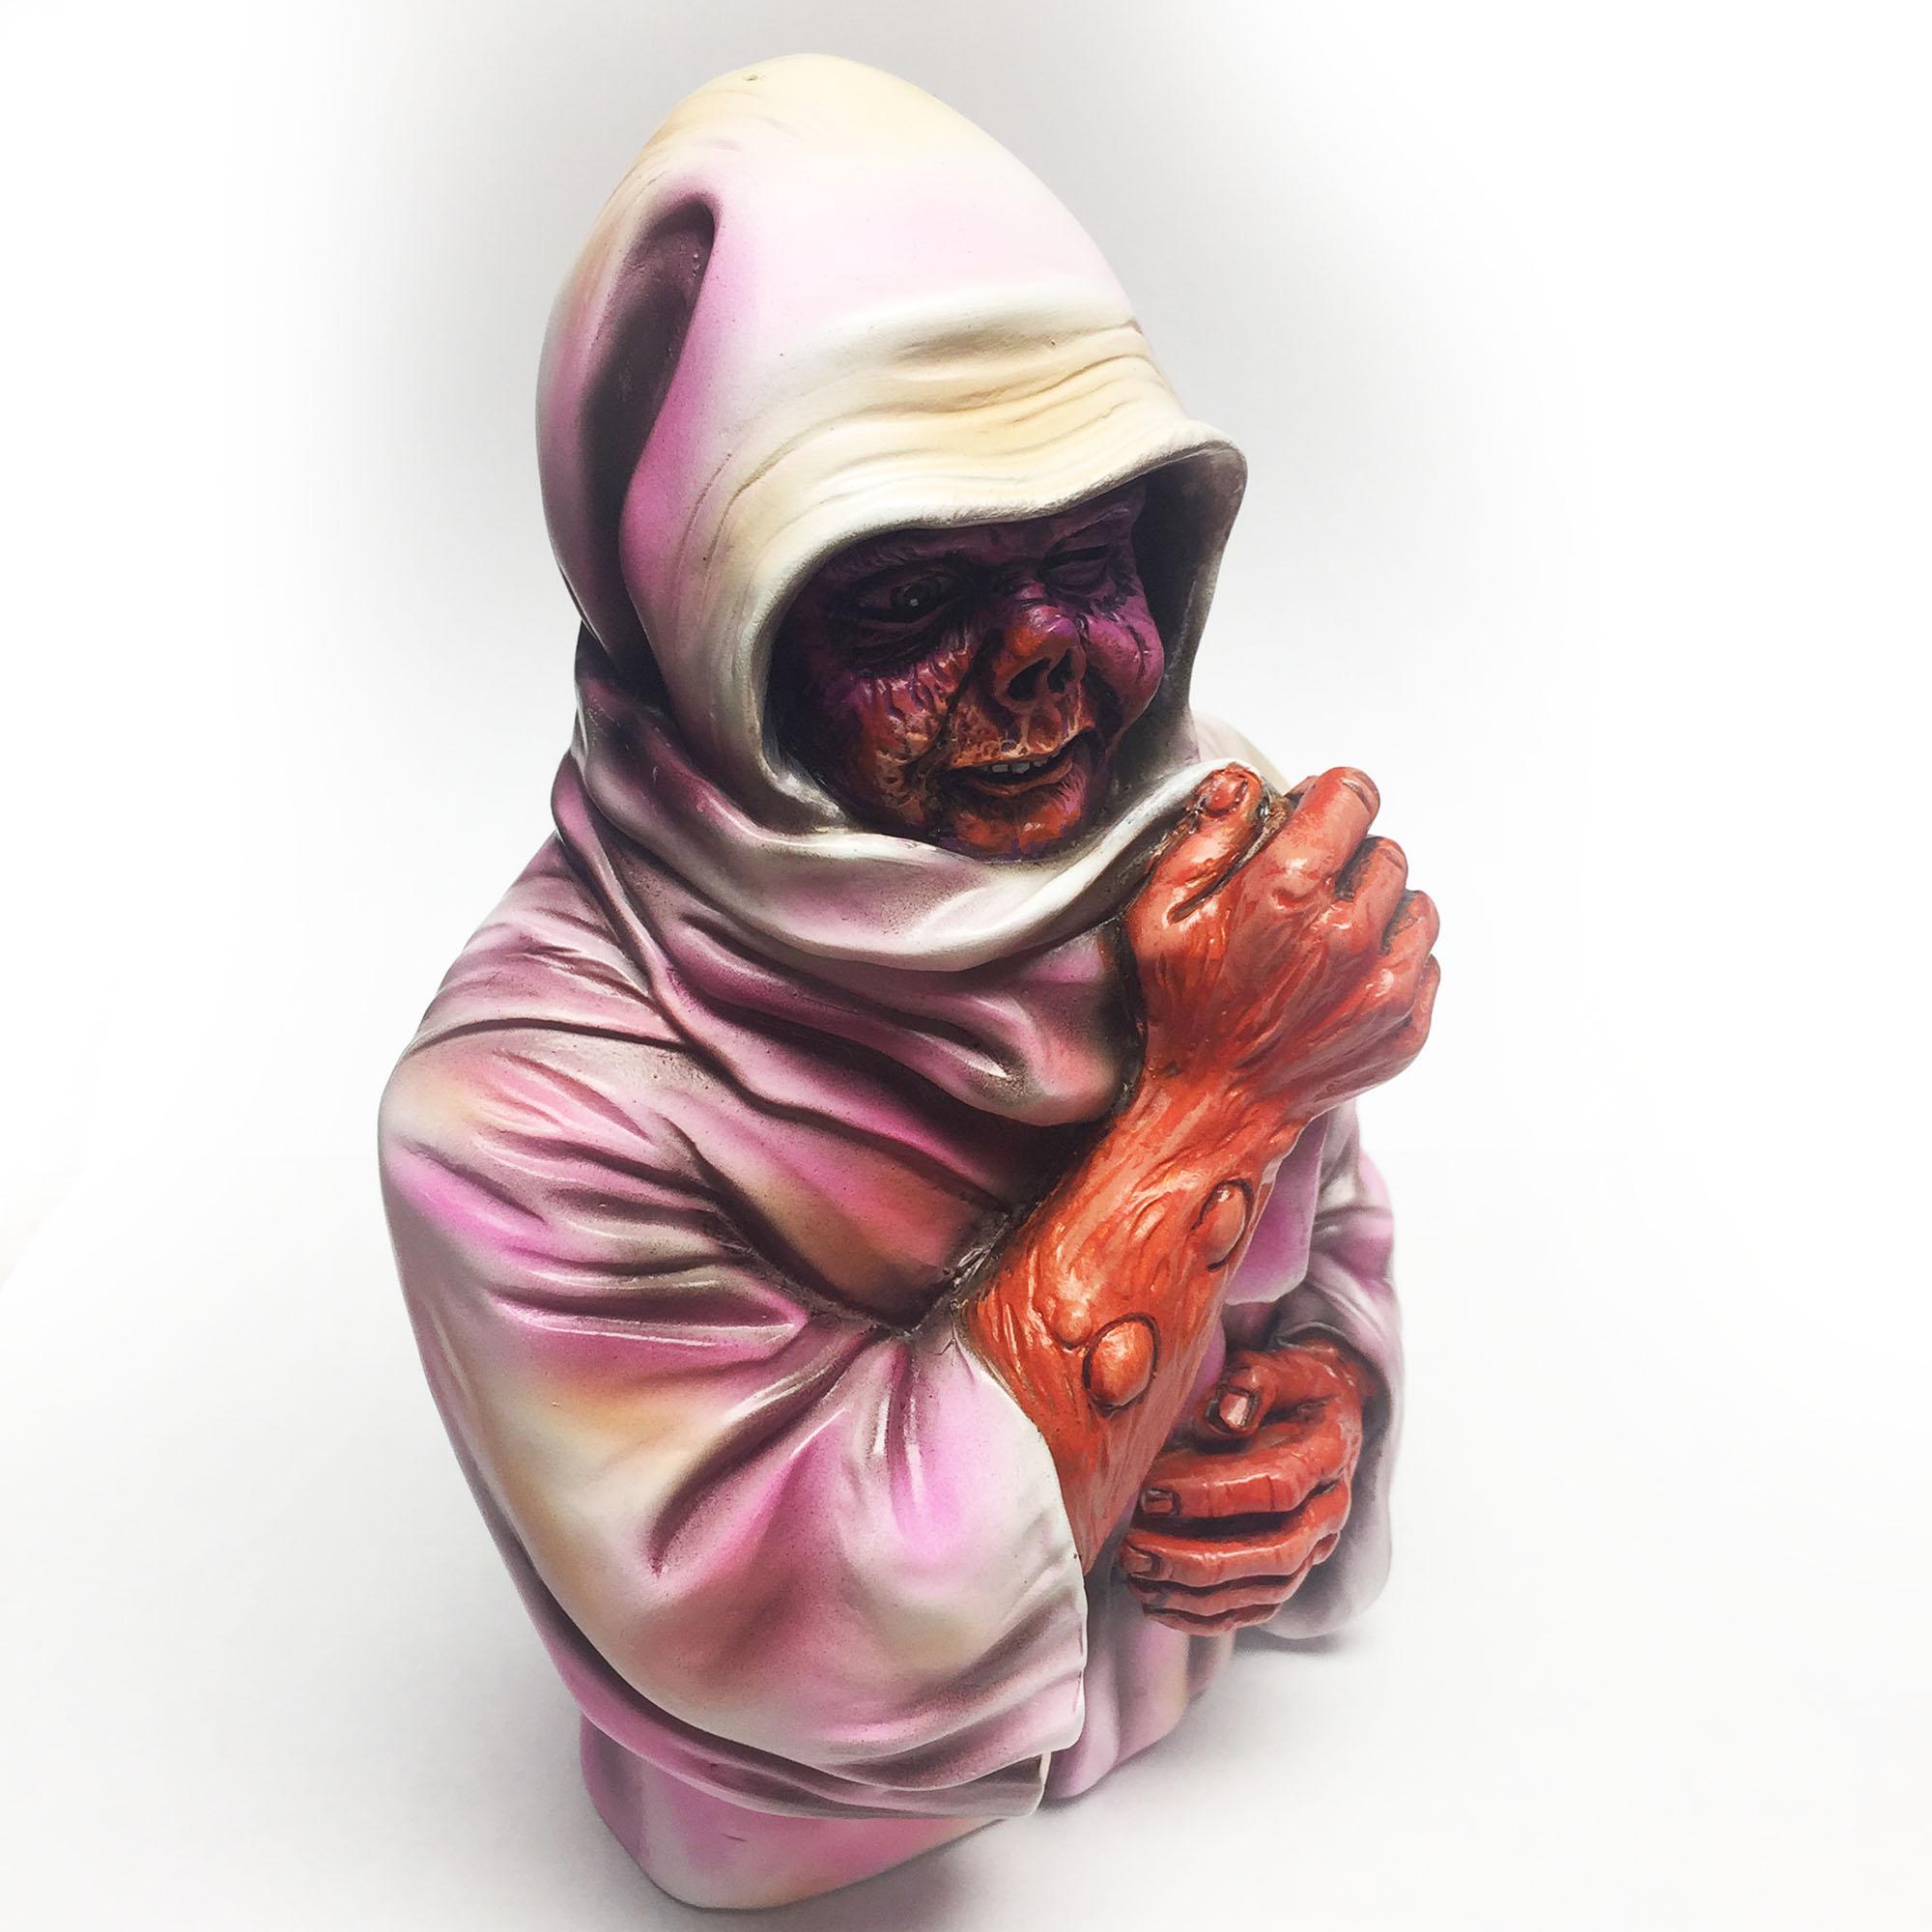 DEATH Leprosy (1988/2019) Réédition + Bust figurine chez RELASPSE RECORDS 5abe4a10